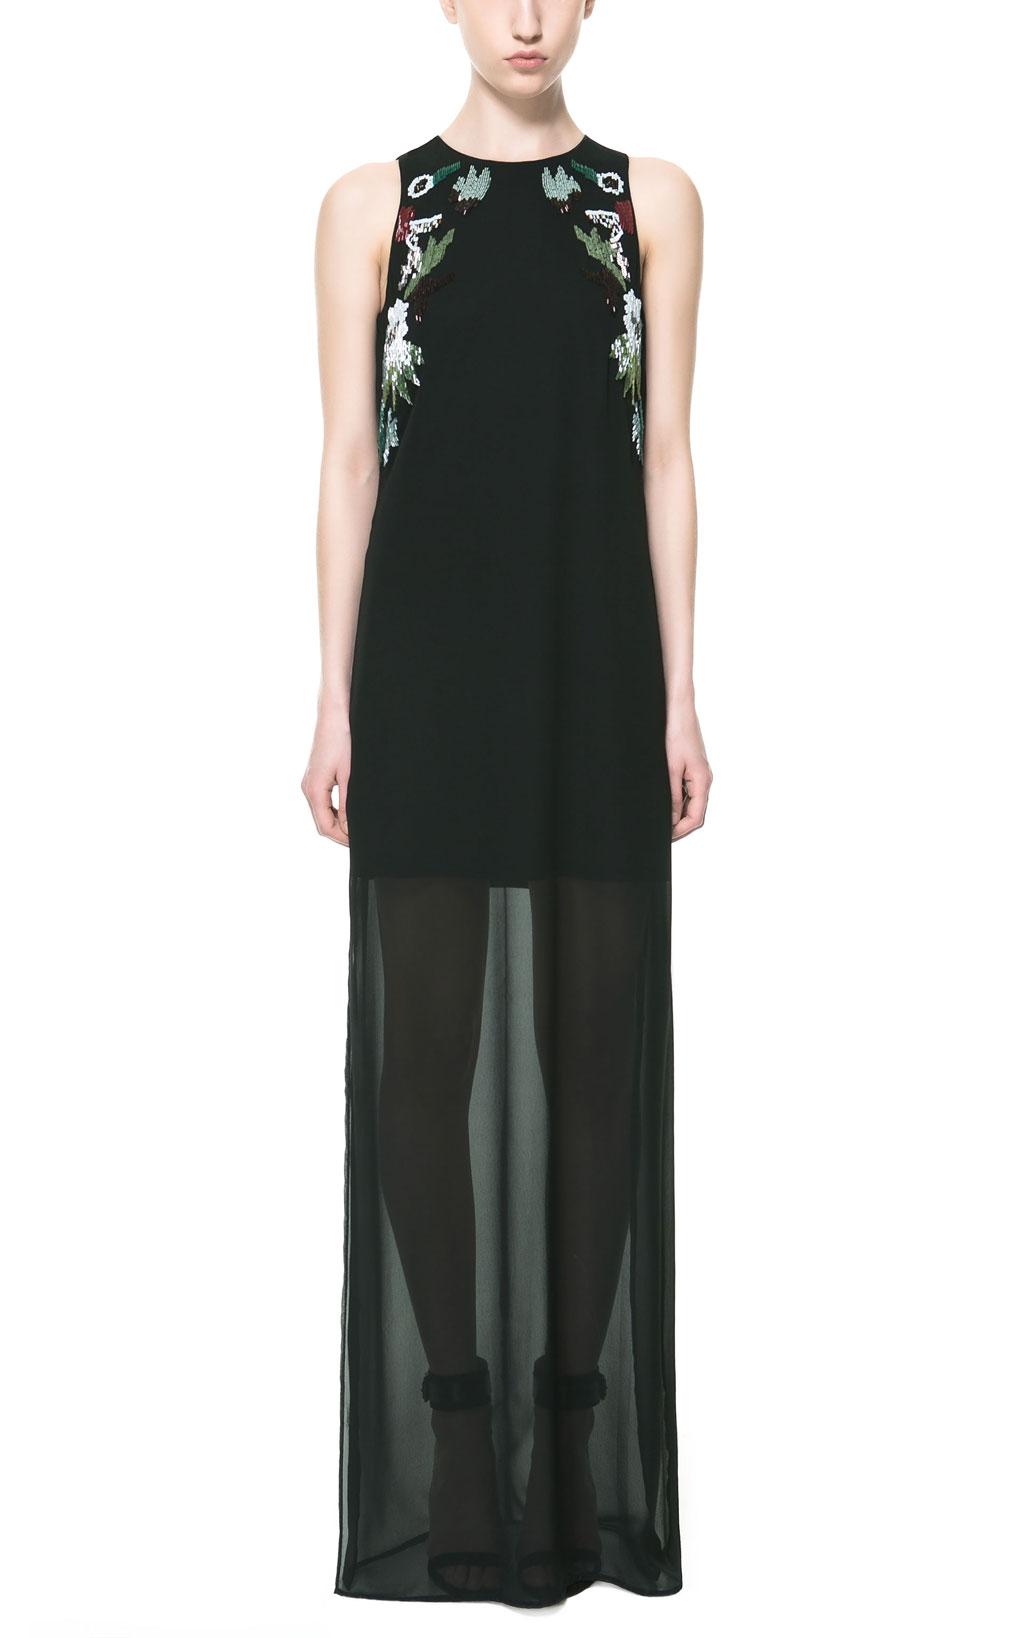 Zara Kleid lang schwarz